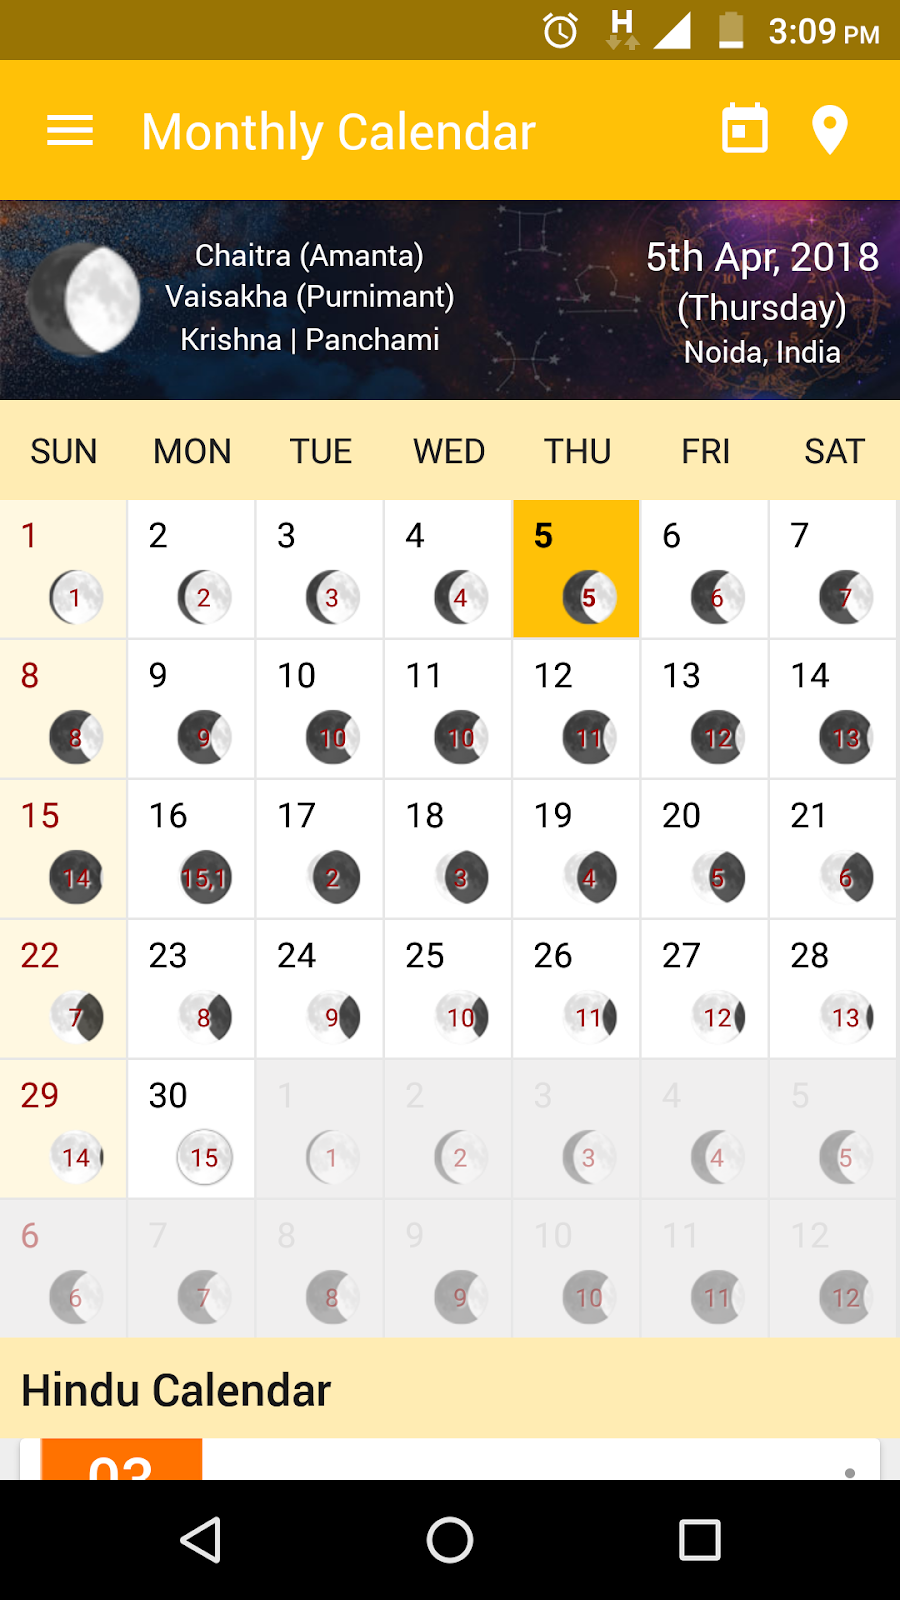 AstroSage Magazine: AstroSage Kundli App is now with Hindu Calendar